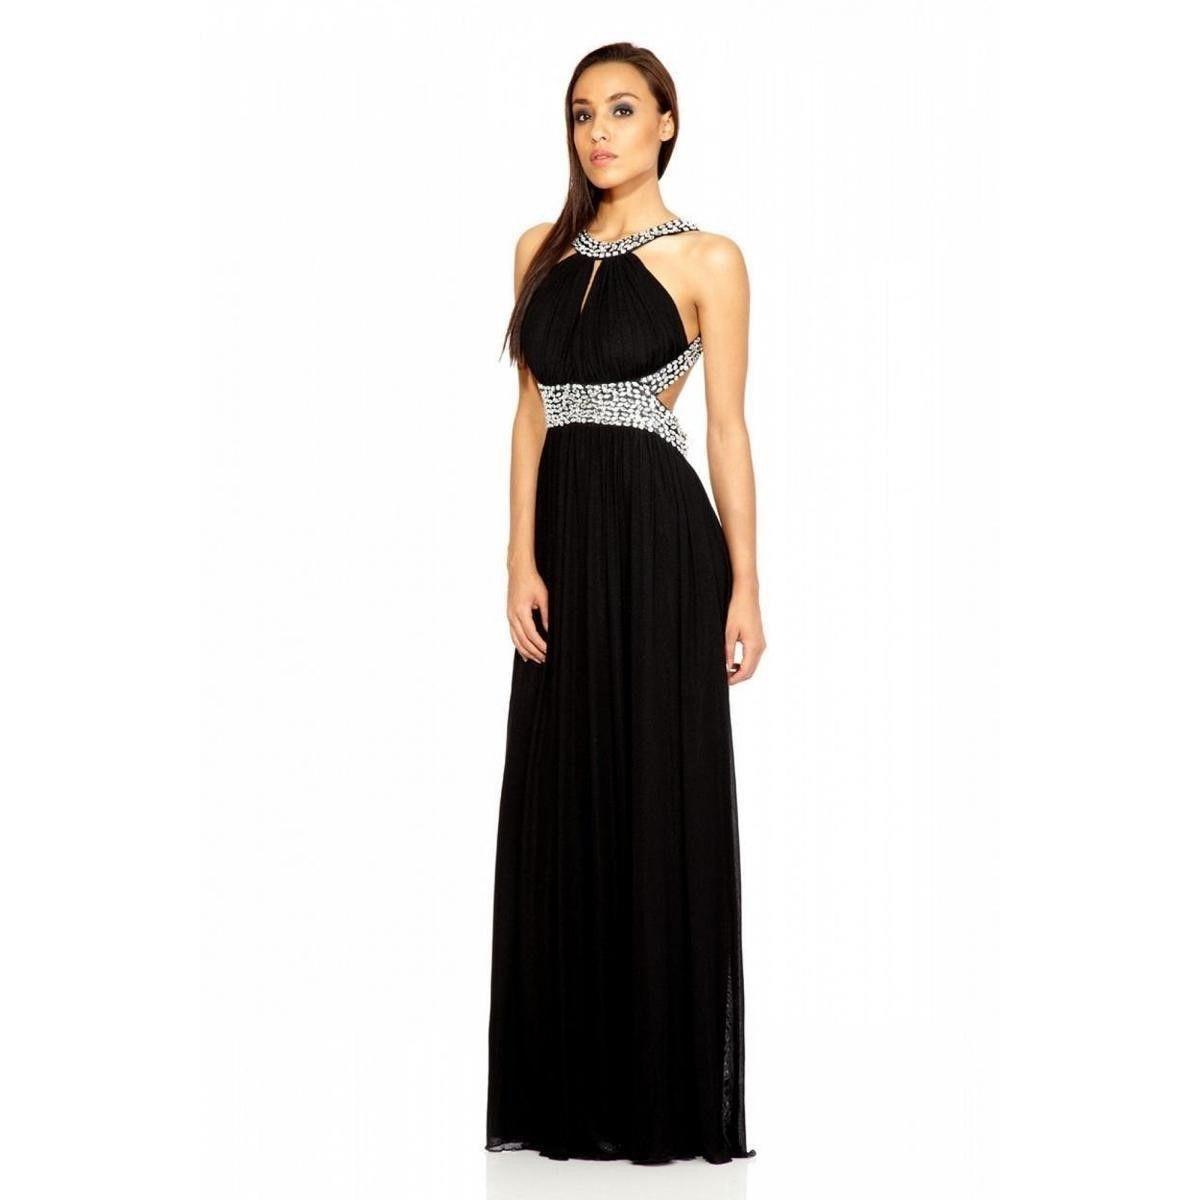 Plus size evening dresses debenhams